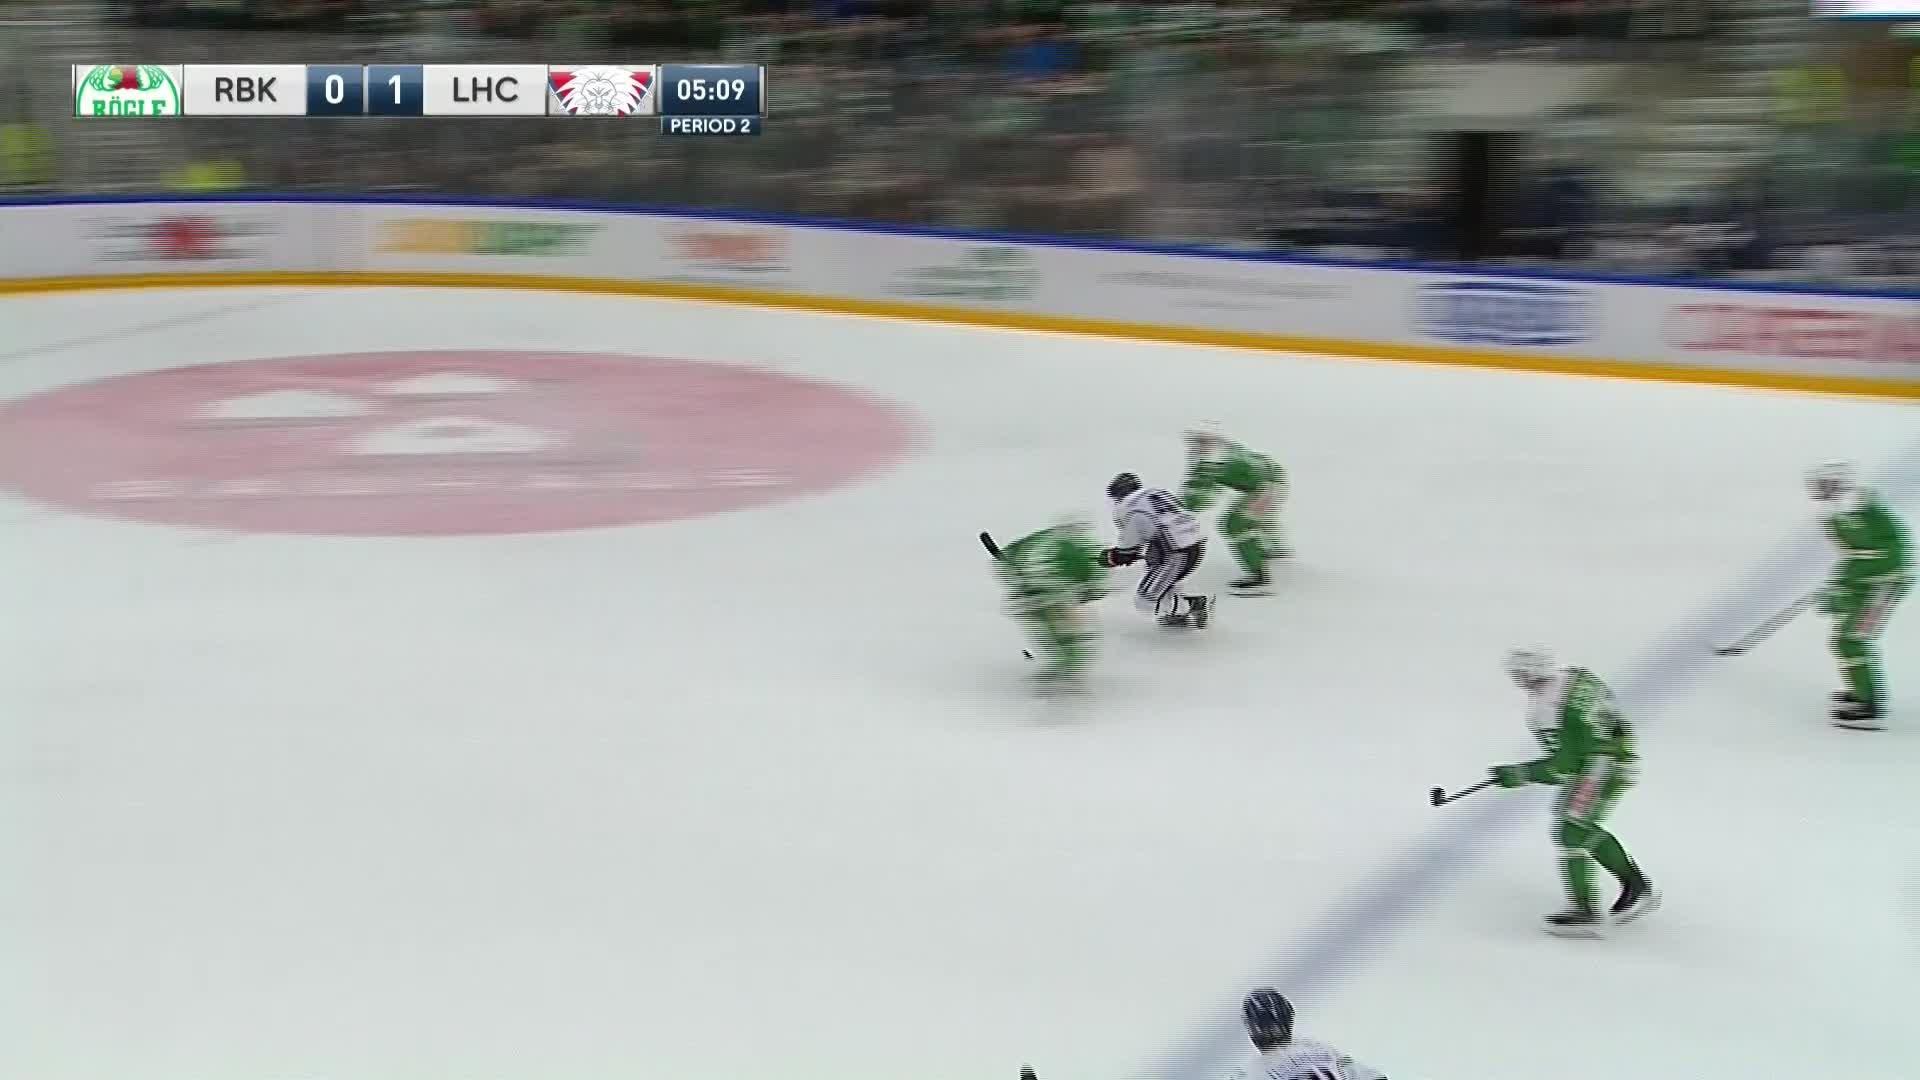 Rögle BK - Linköping HC 0-2